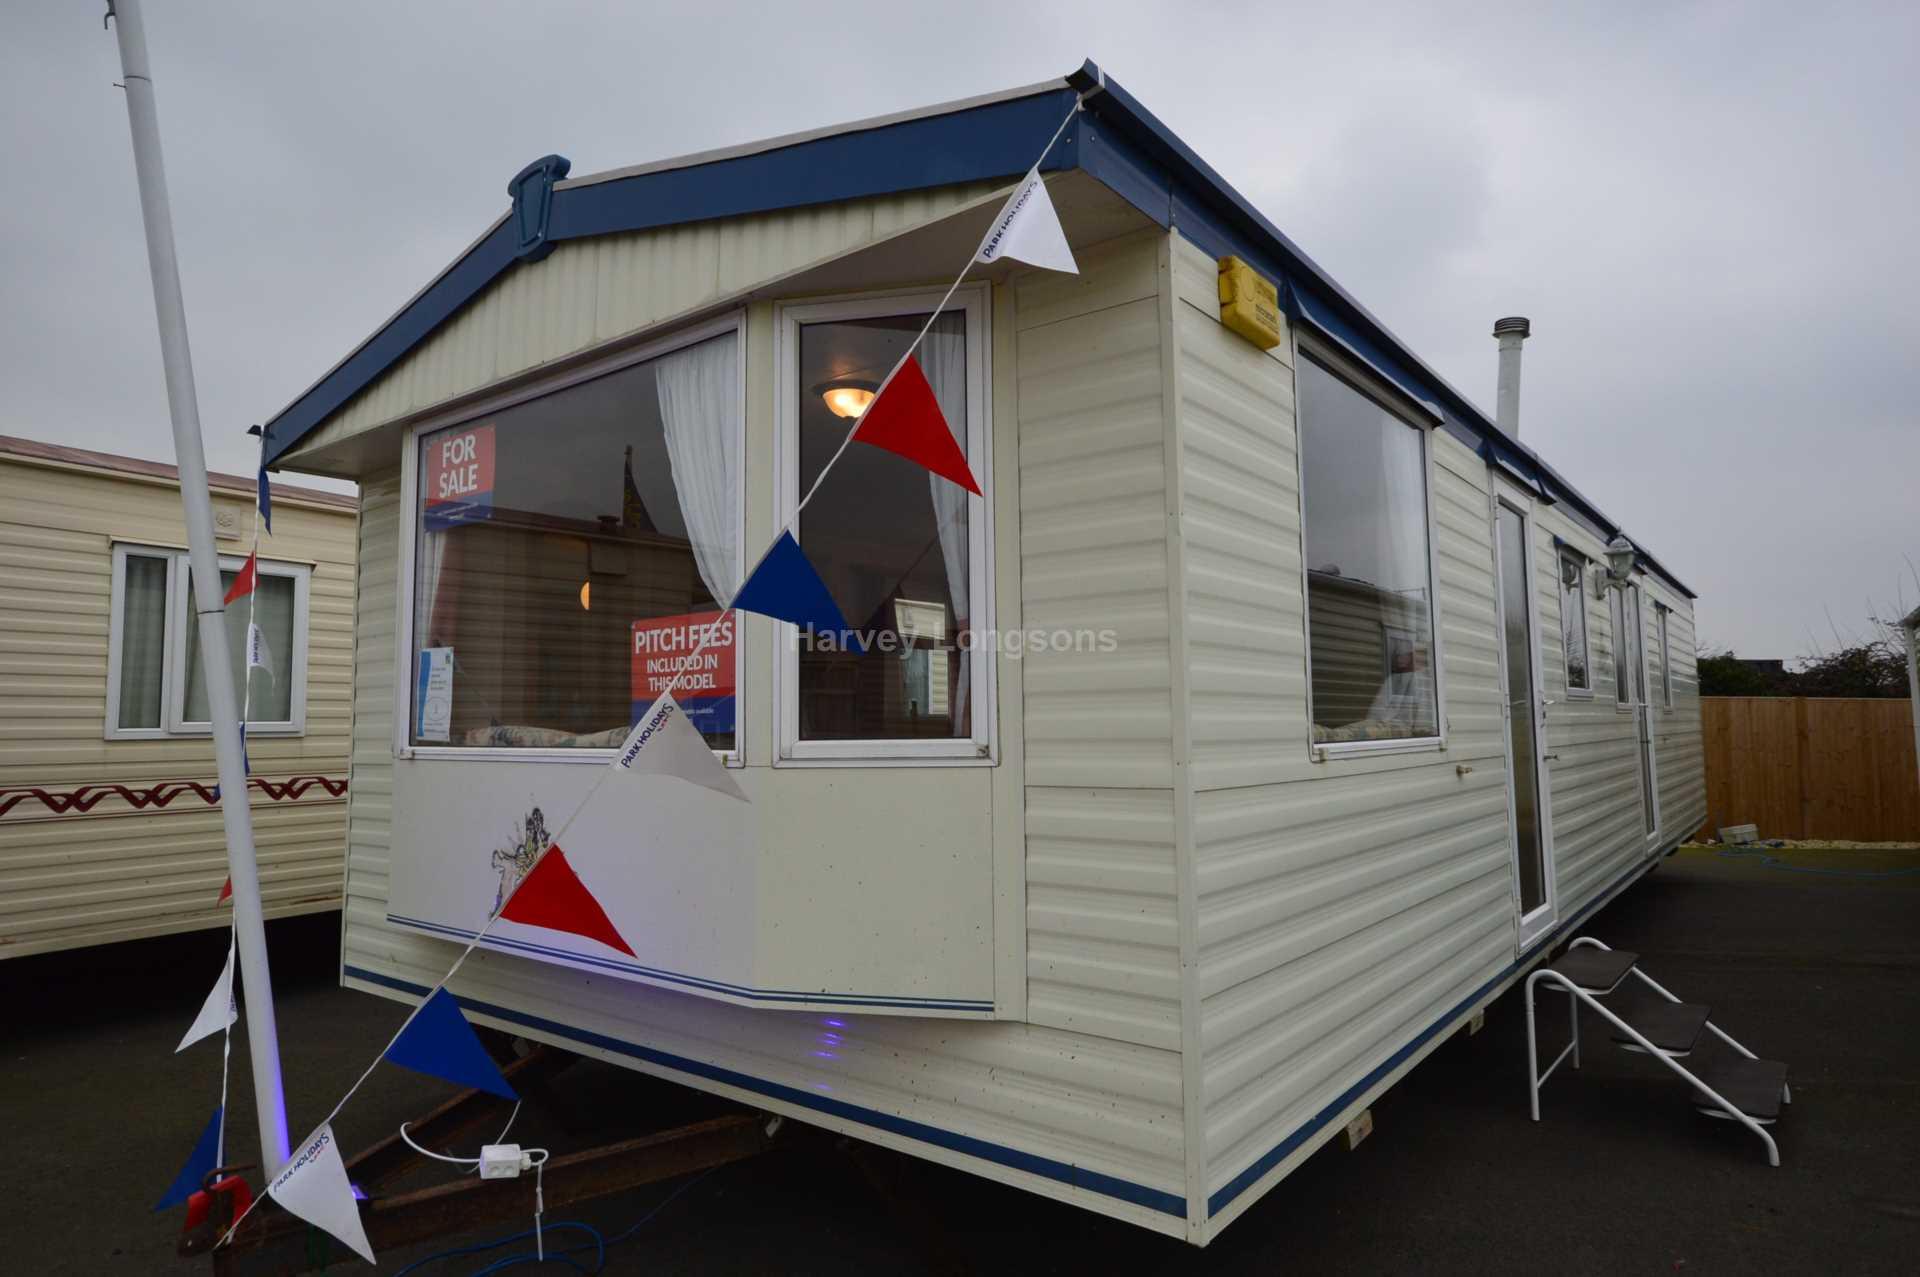 Wonderful Bedroom Caravan For Sale Harts Holiday Park Leysdown Road Leysdown